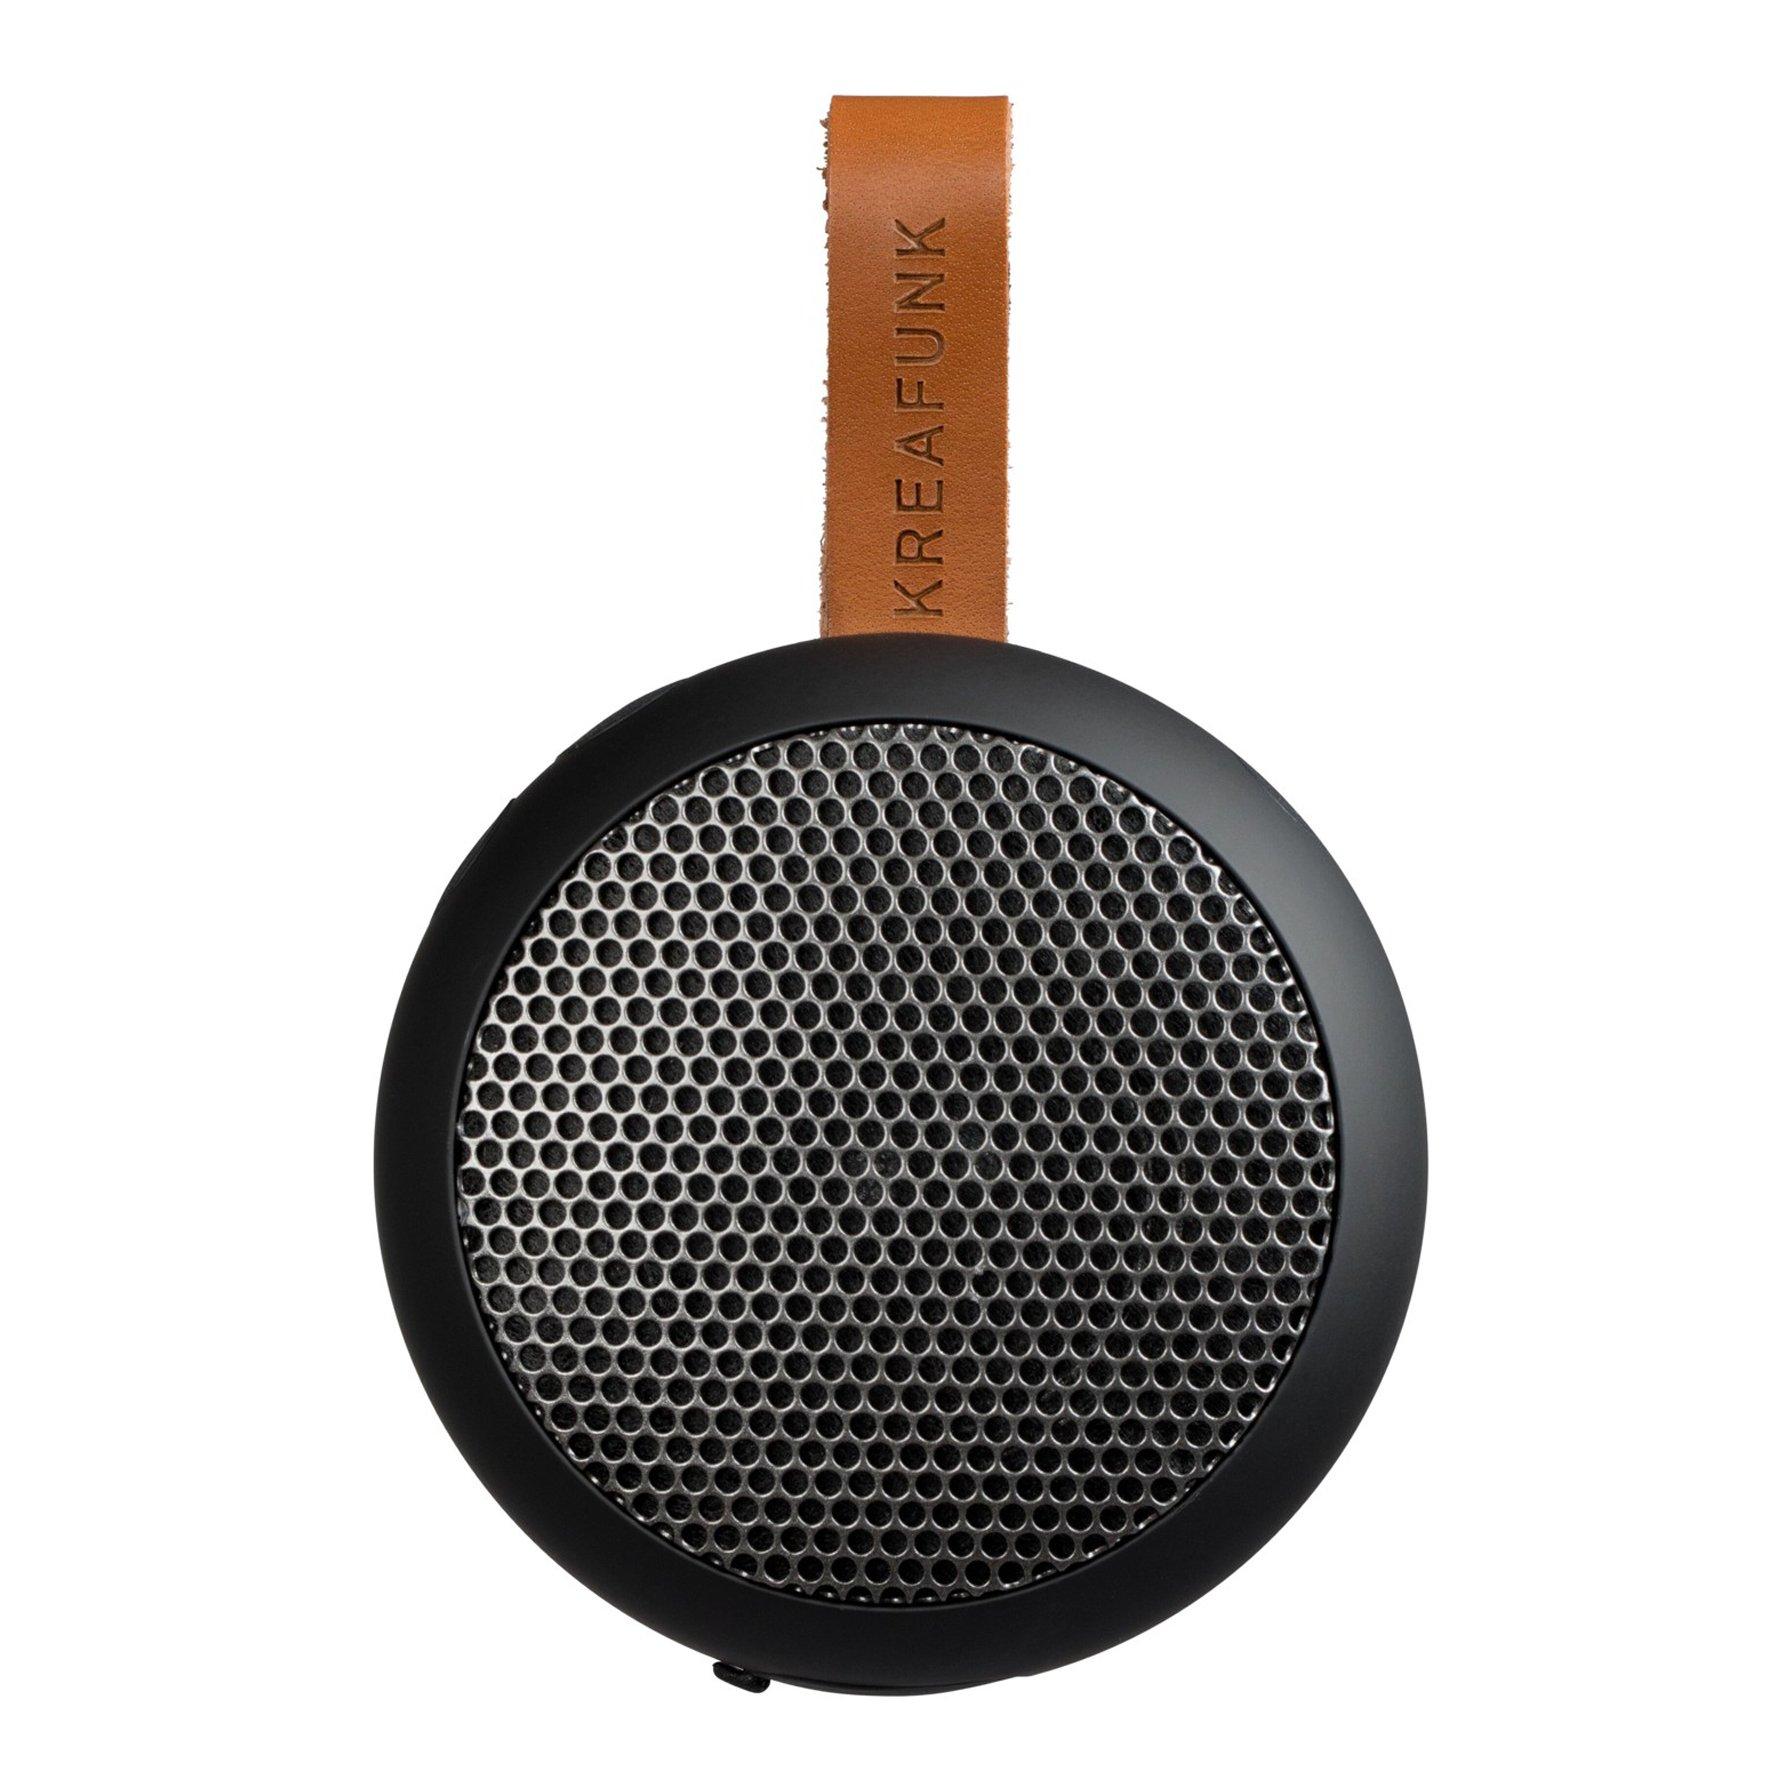 KreaFunk - aGO Bluetooth Speaker - Black Edition/Gun Metal Grill (Kfwt30)